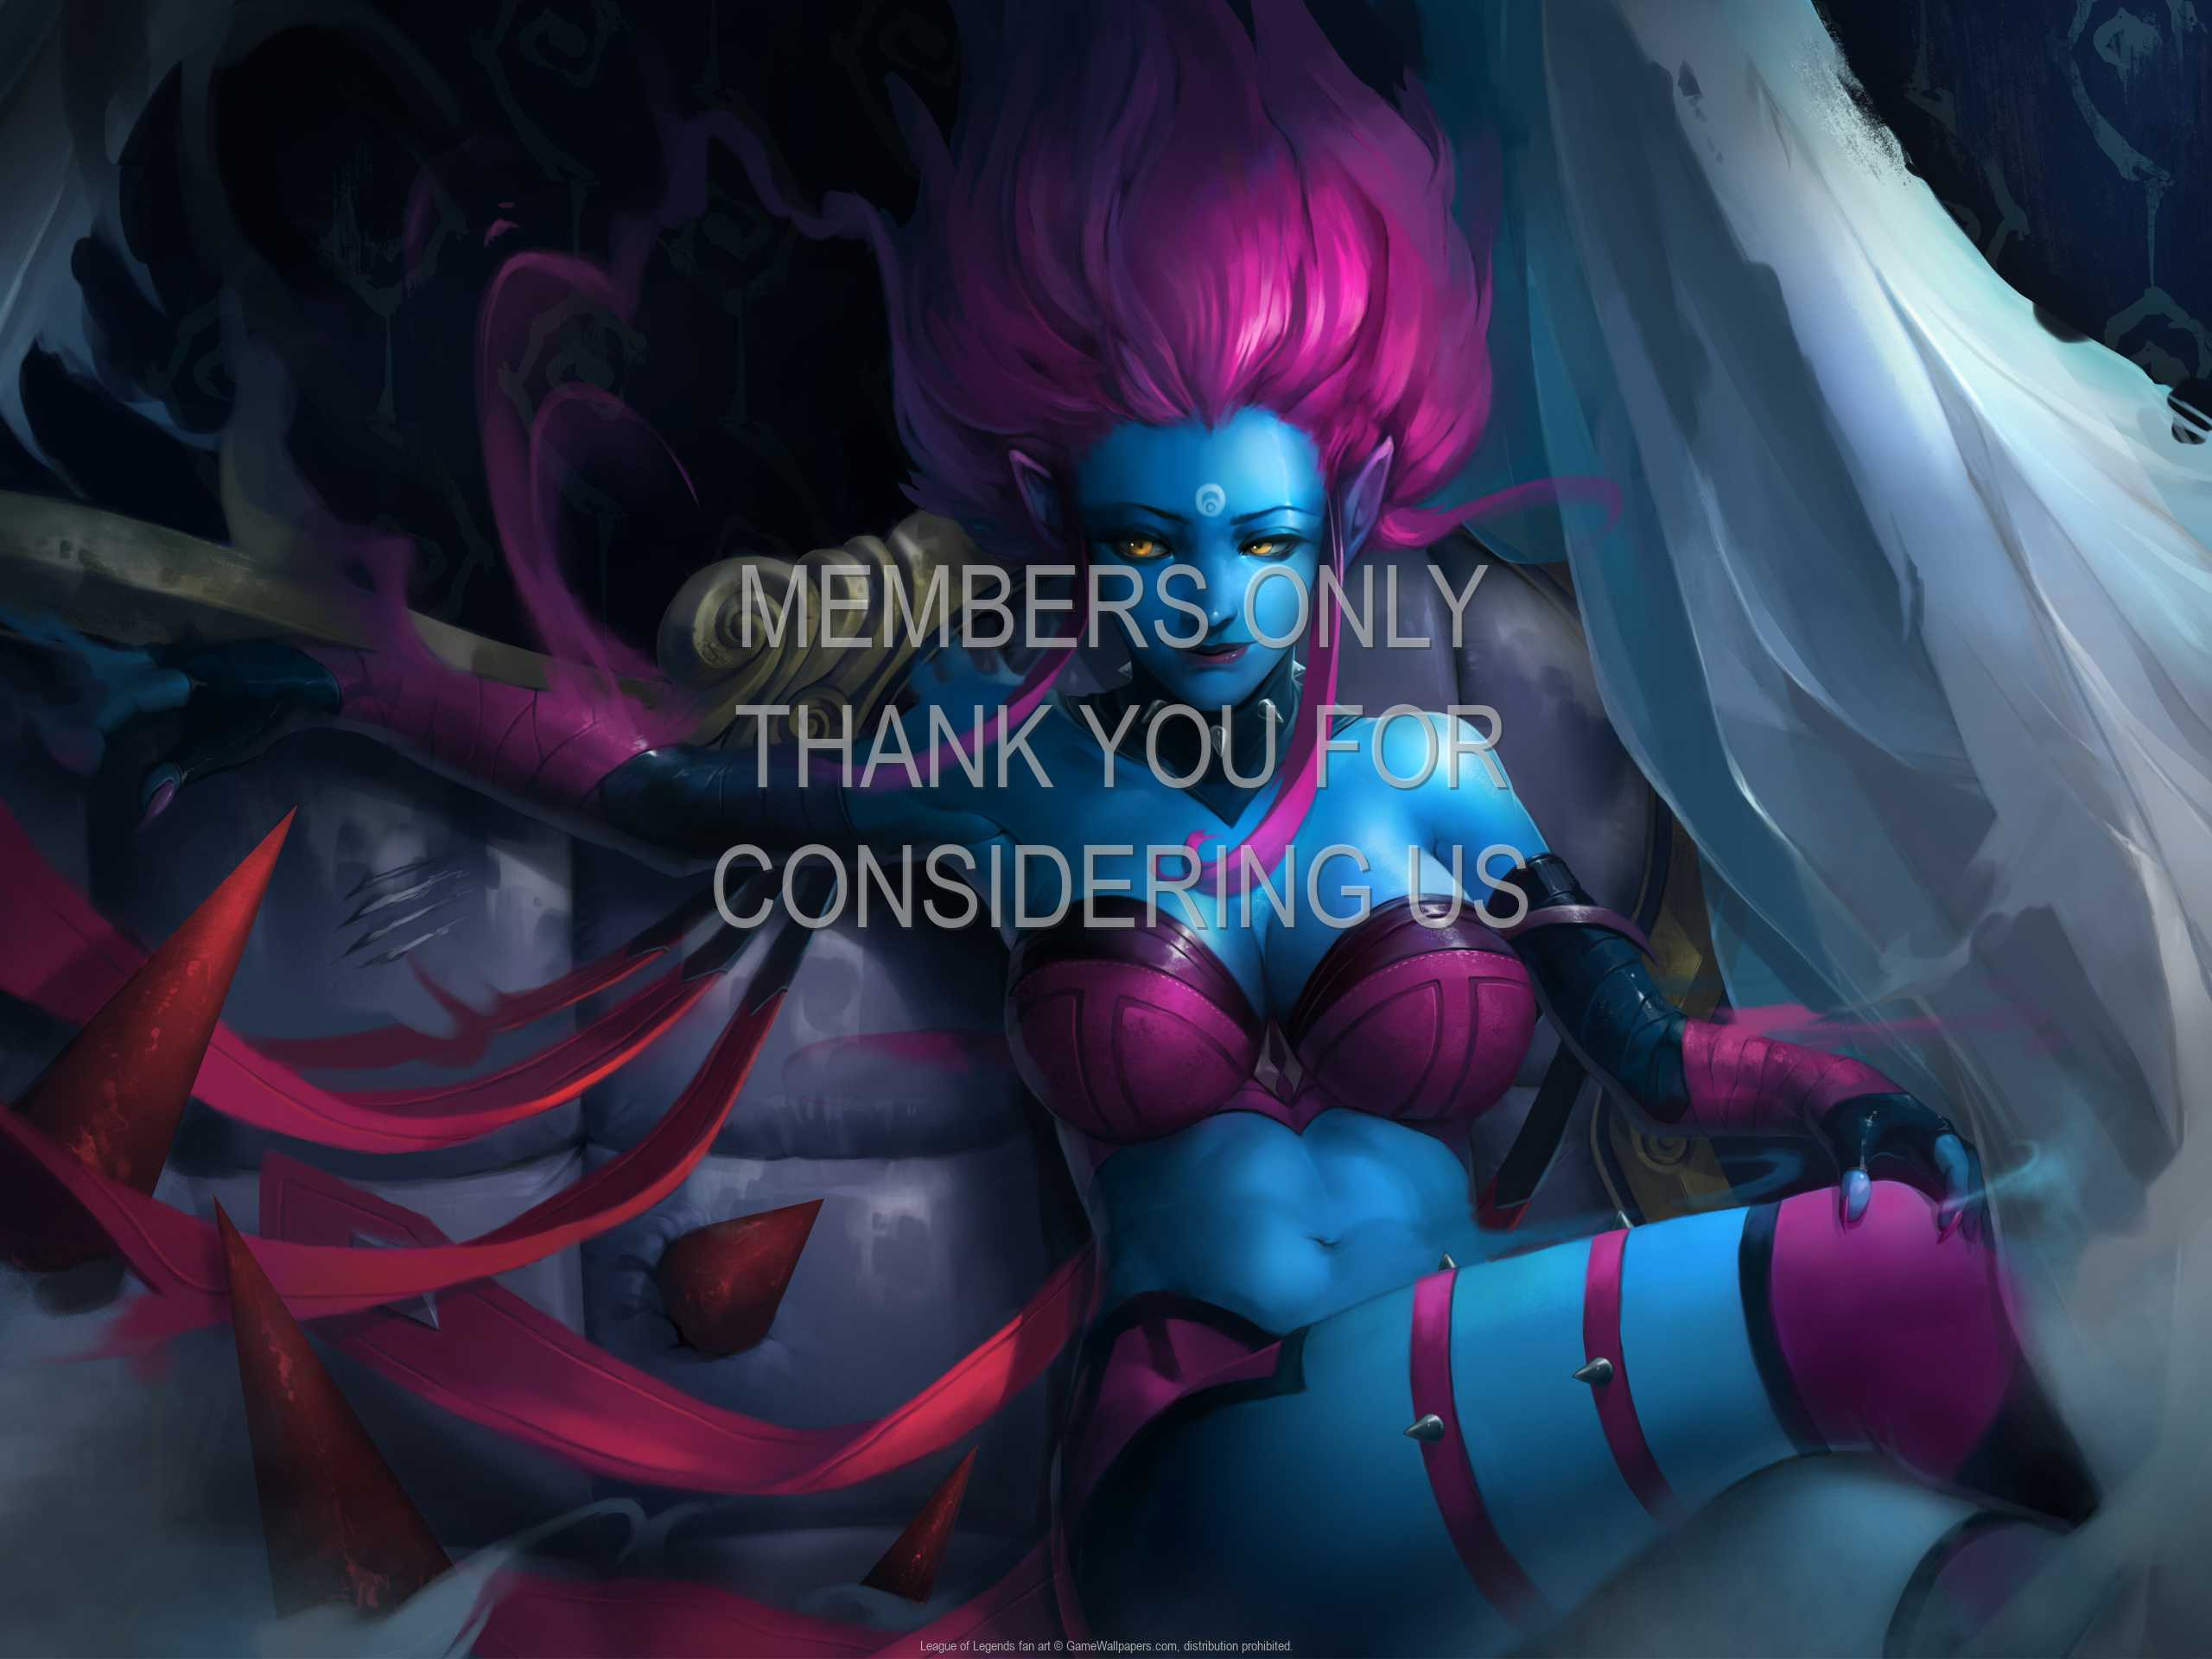 League of Legends fan art 1080p Horizontal Mobile wallpaper or background 05